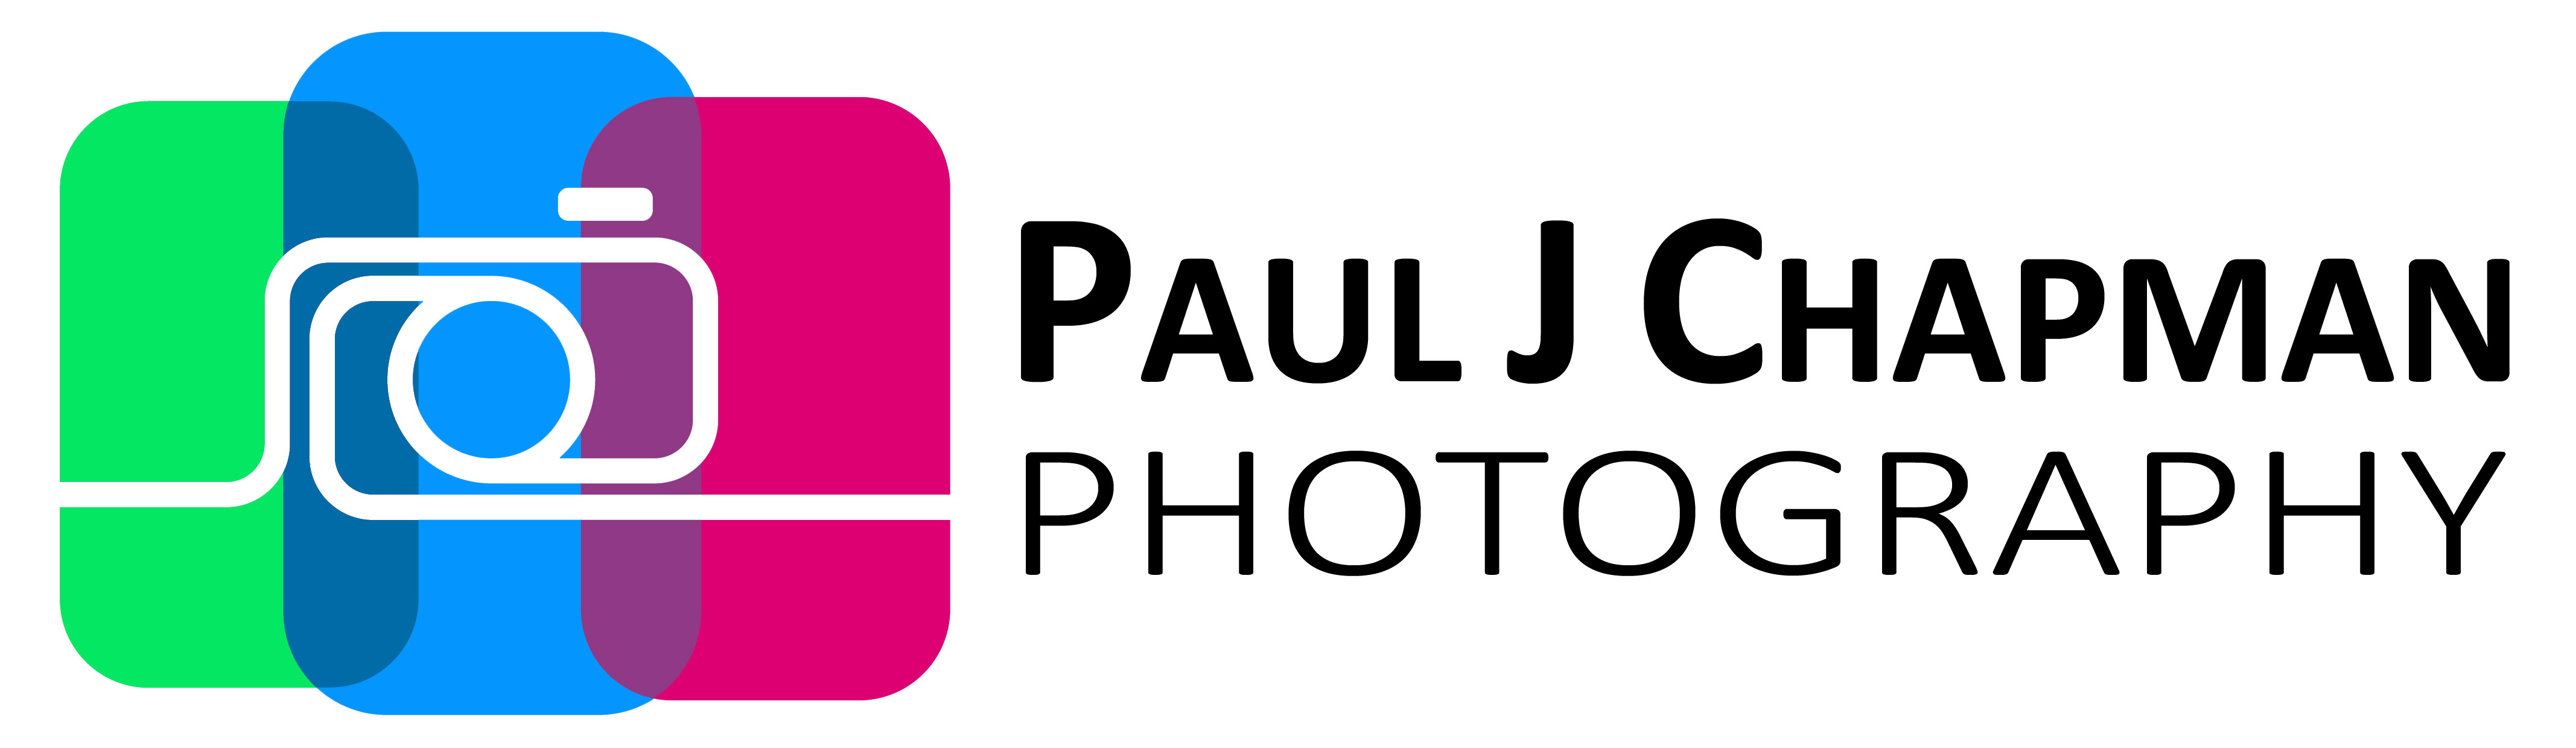 Paul J Chapman Photography